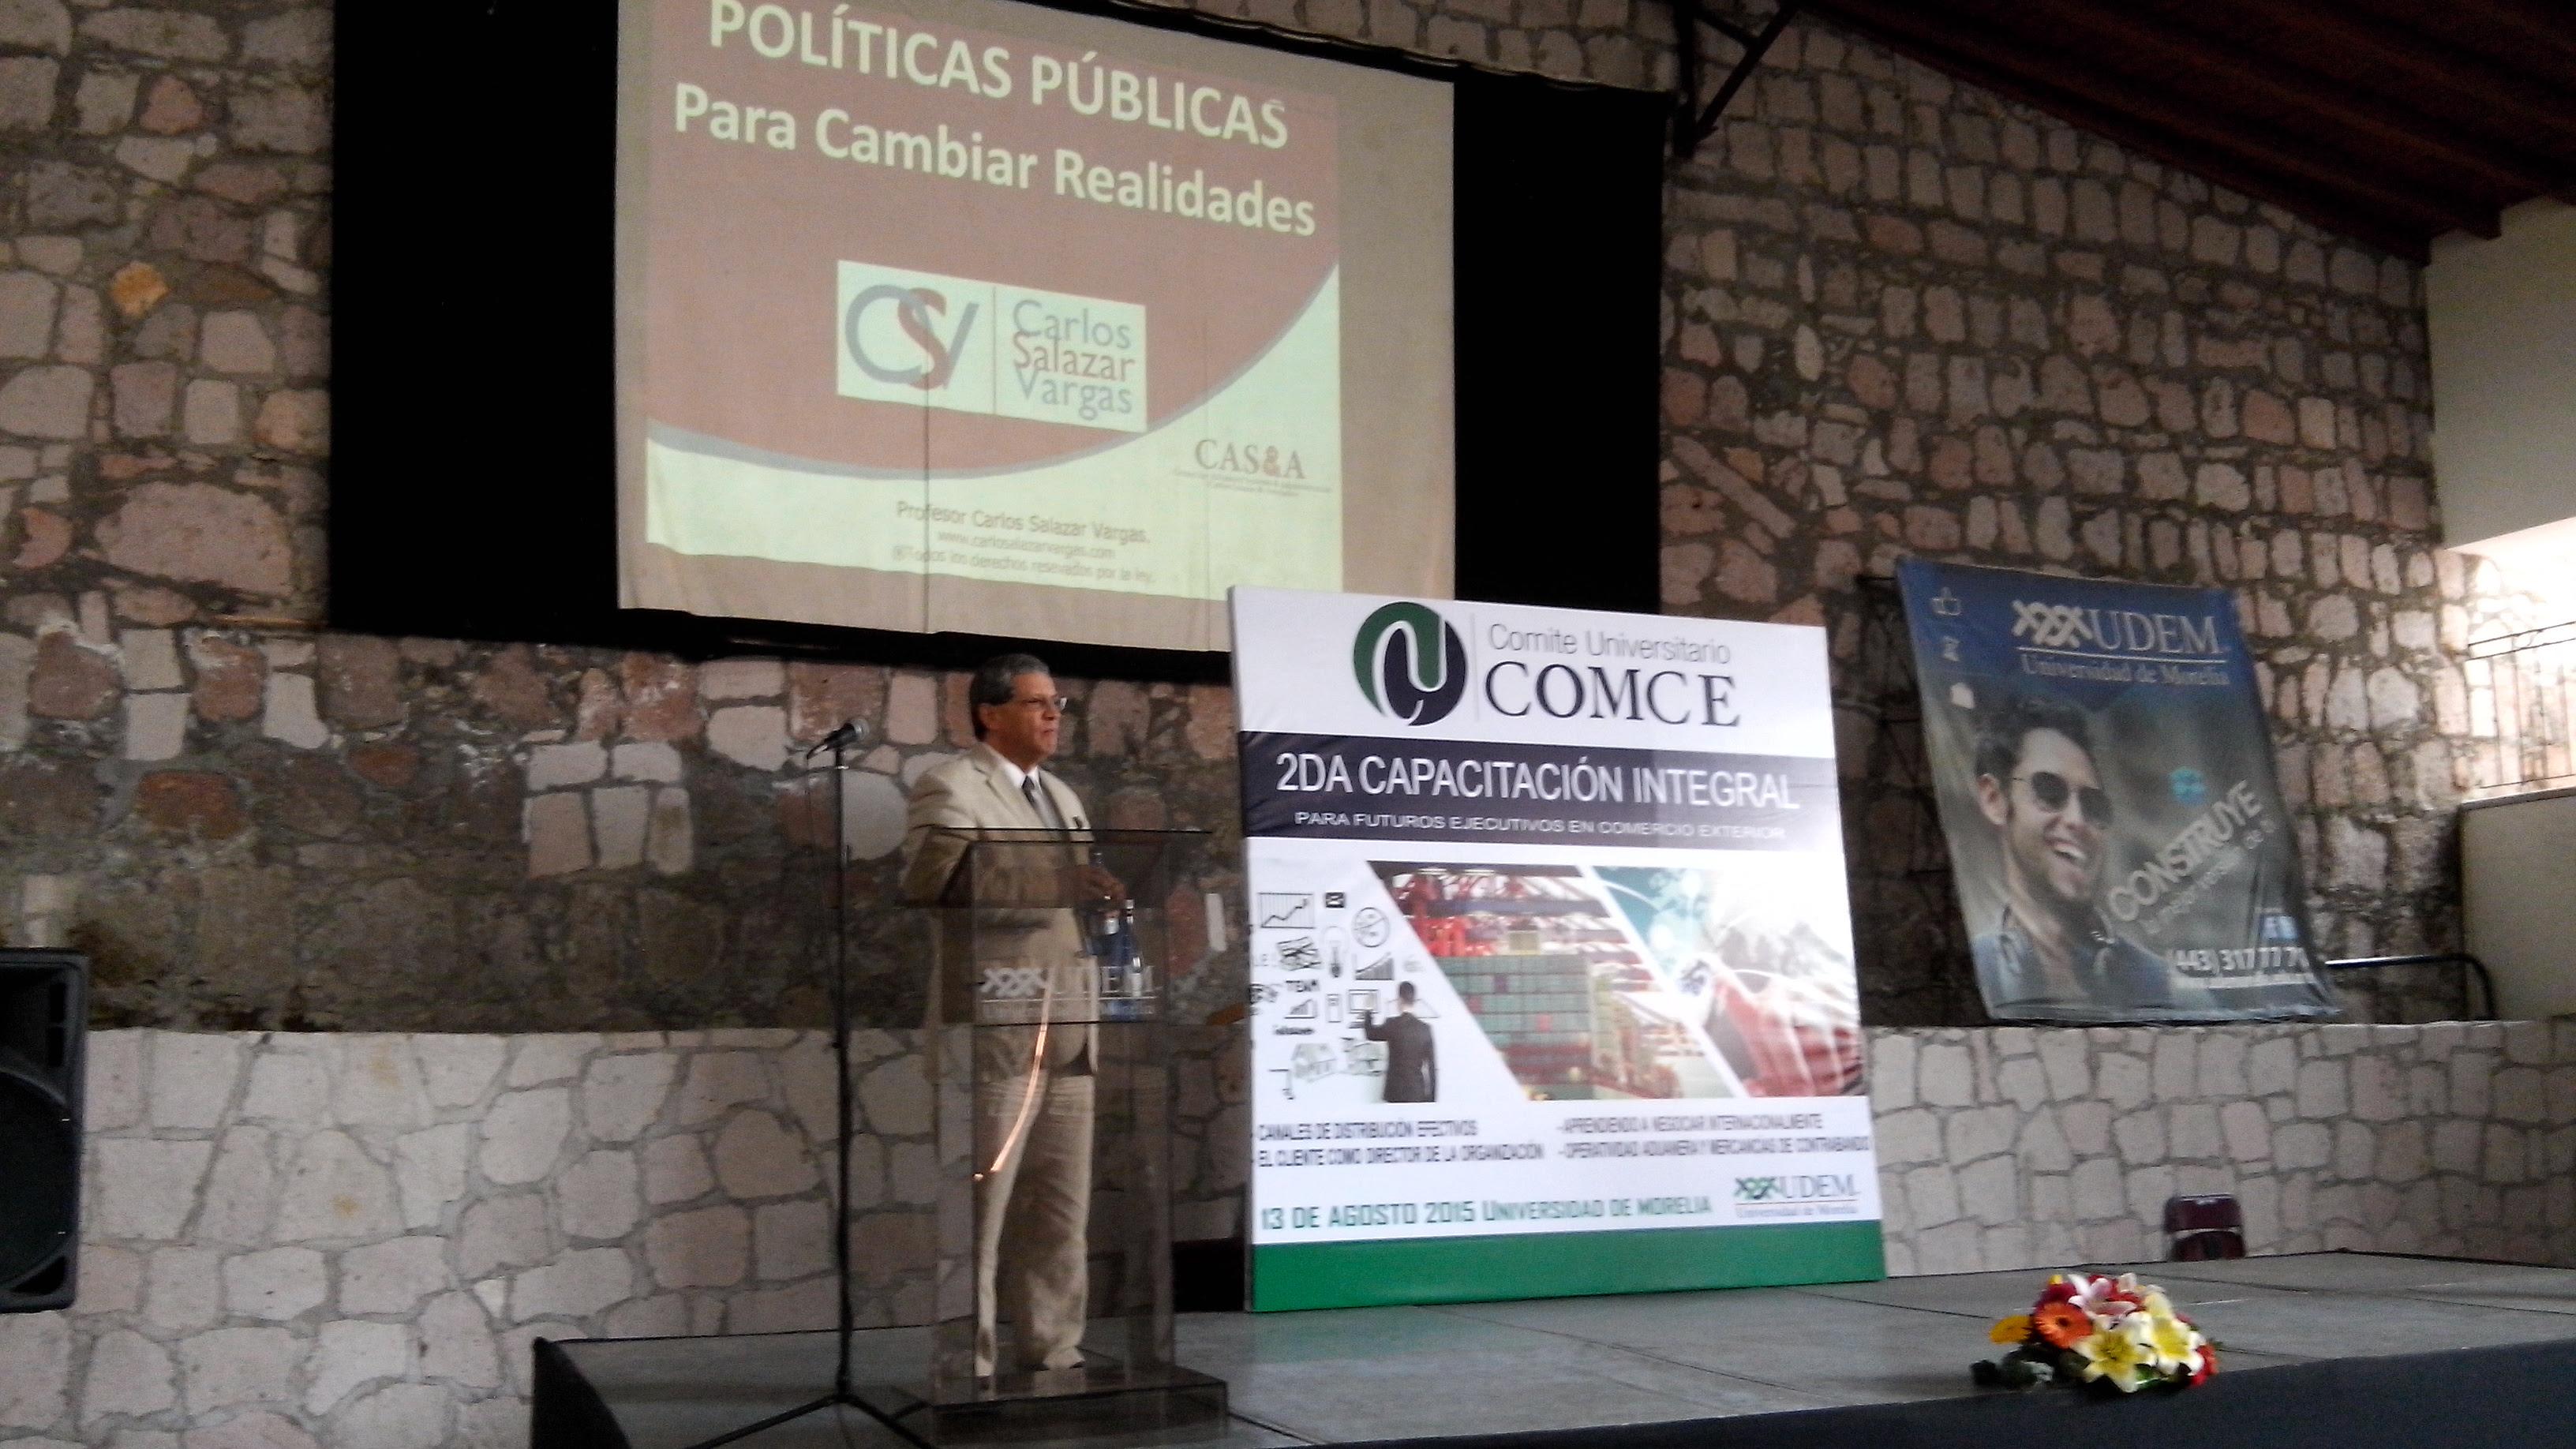 Uvaq Participa Con El Comce En La Especializaci N De Comercio Exterior Quadrat N Michoac N